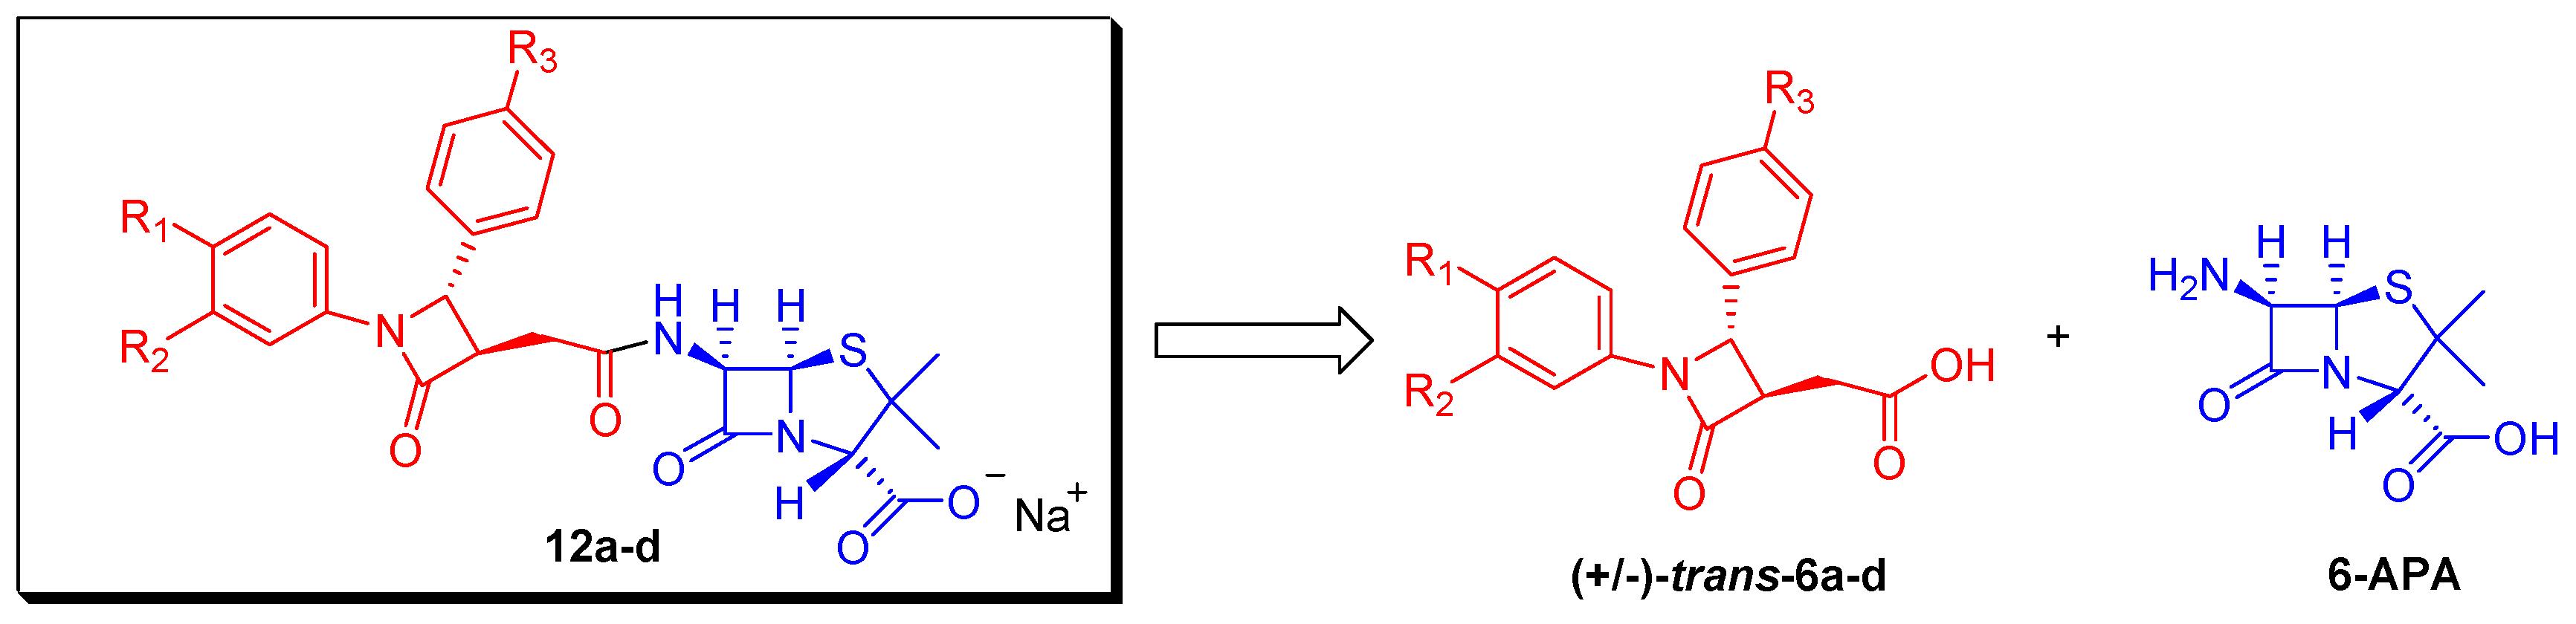 molecules free full text novel penicillin type analogues bearing